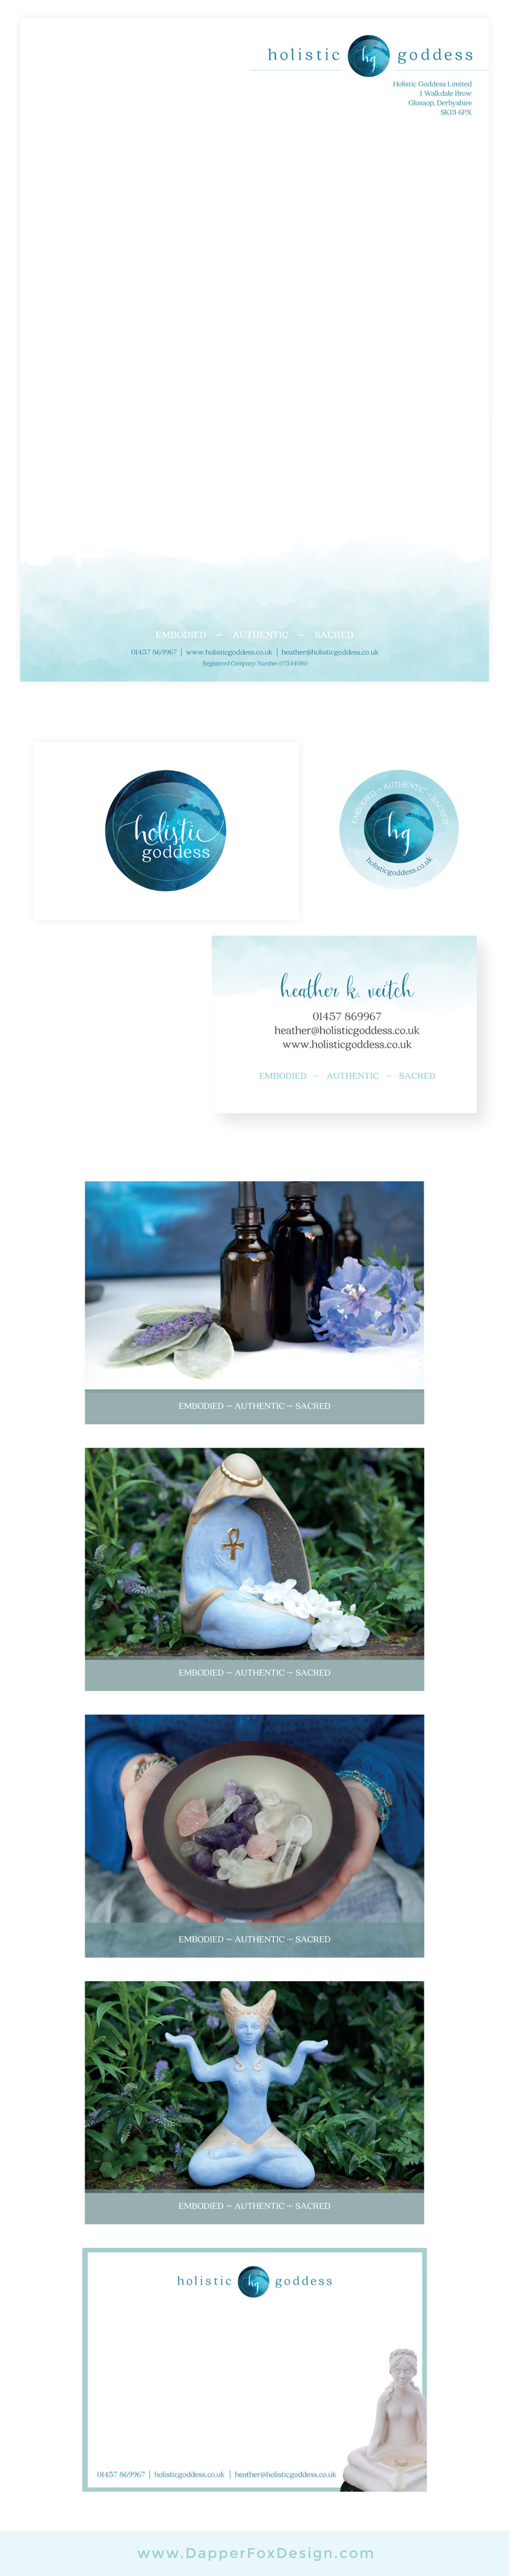 Holistic Goddess branding business card, letterhead, collateral Design by Dapper Fox Design - Ocean Logo, blue, modern logo design